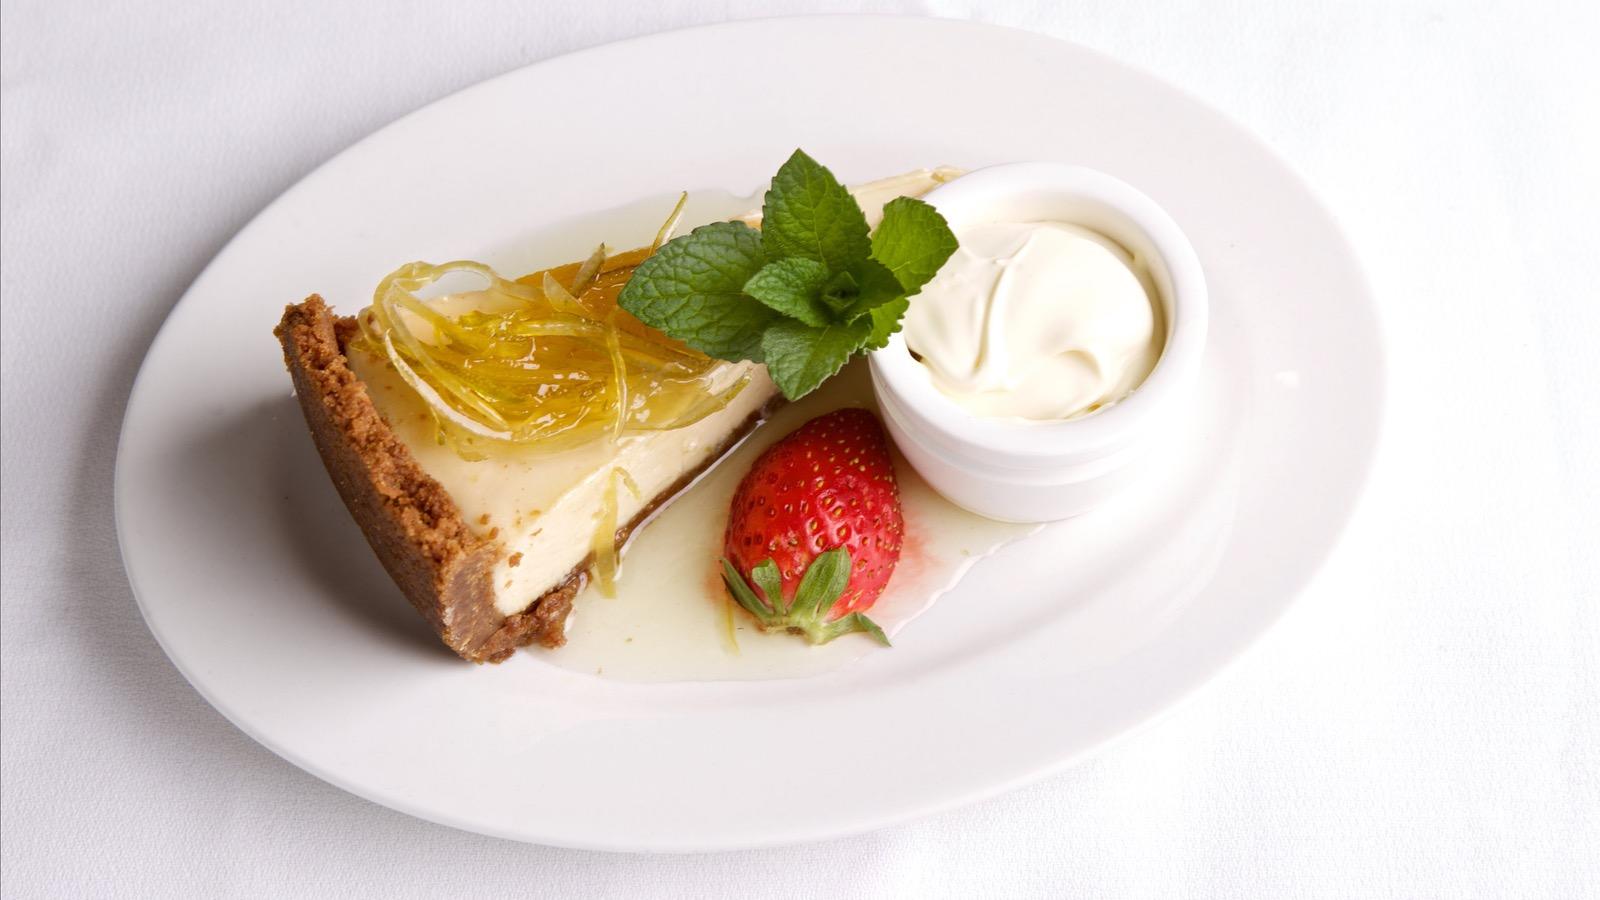 Key Lime Pie served aboard Steam & Cuisine After Dark